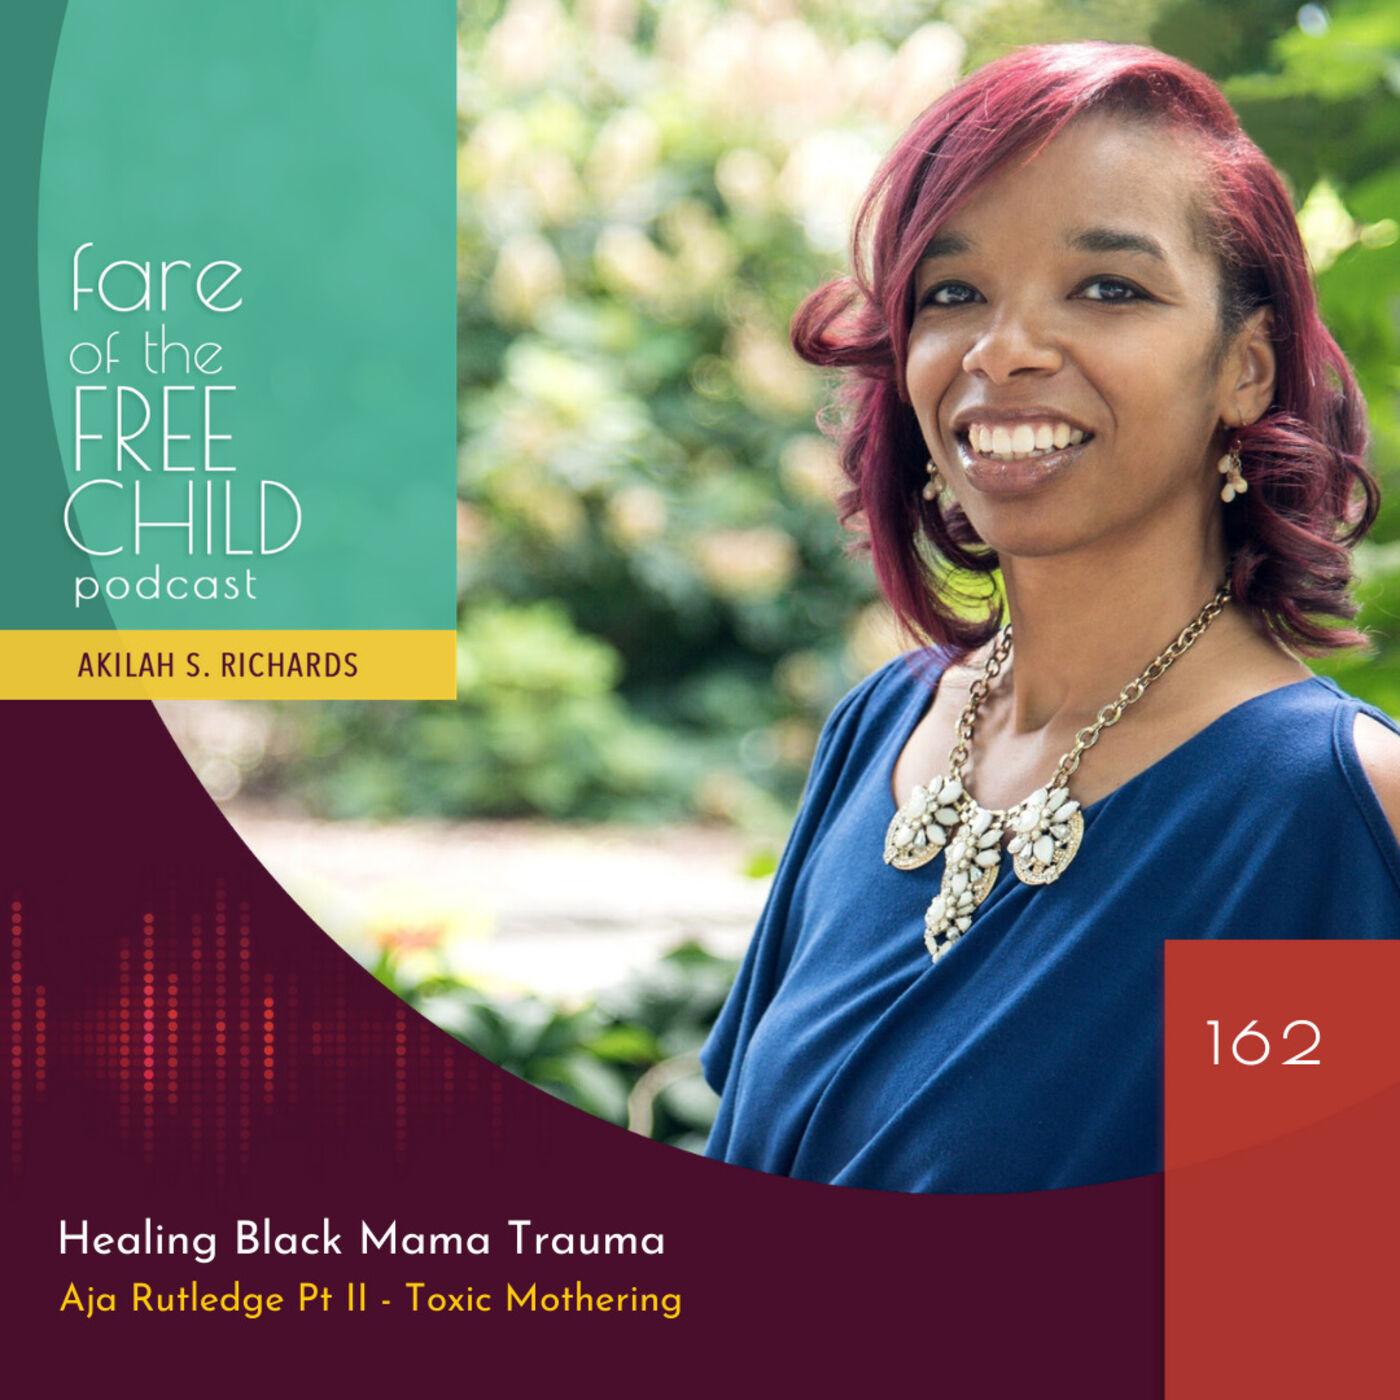 Ep 162: Healing Black Mama Trauma